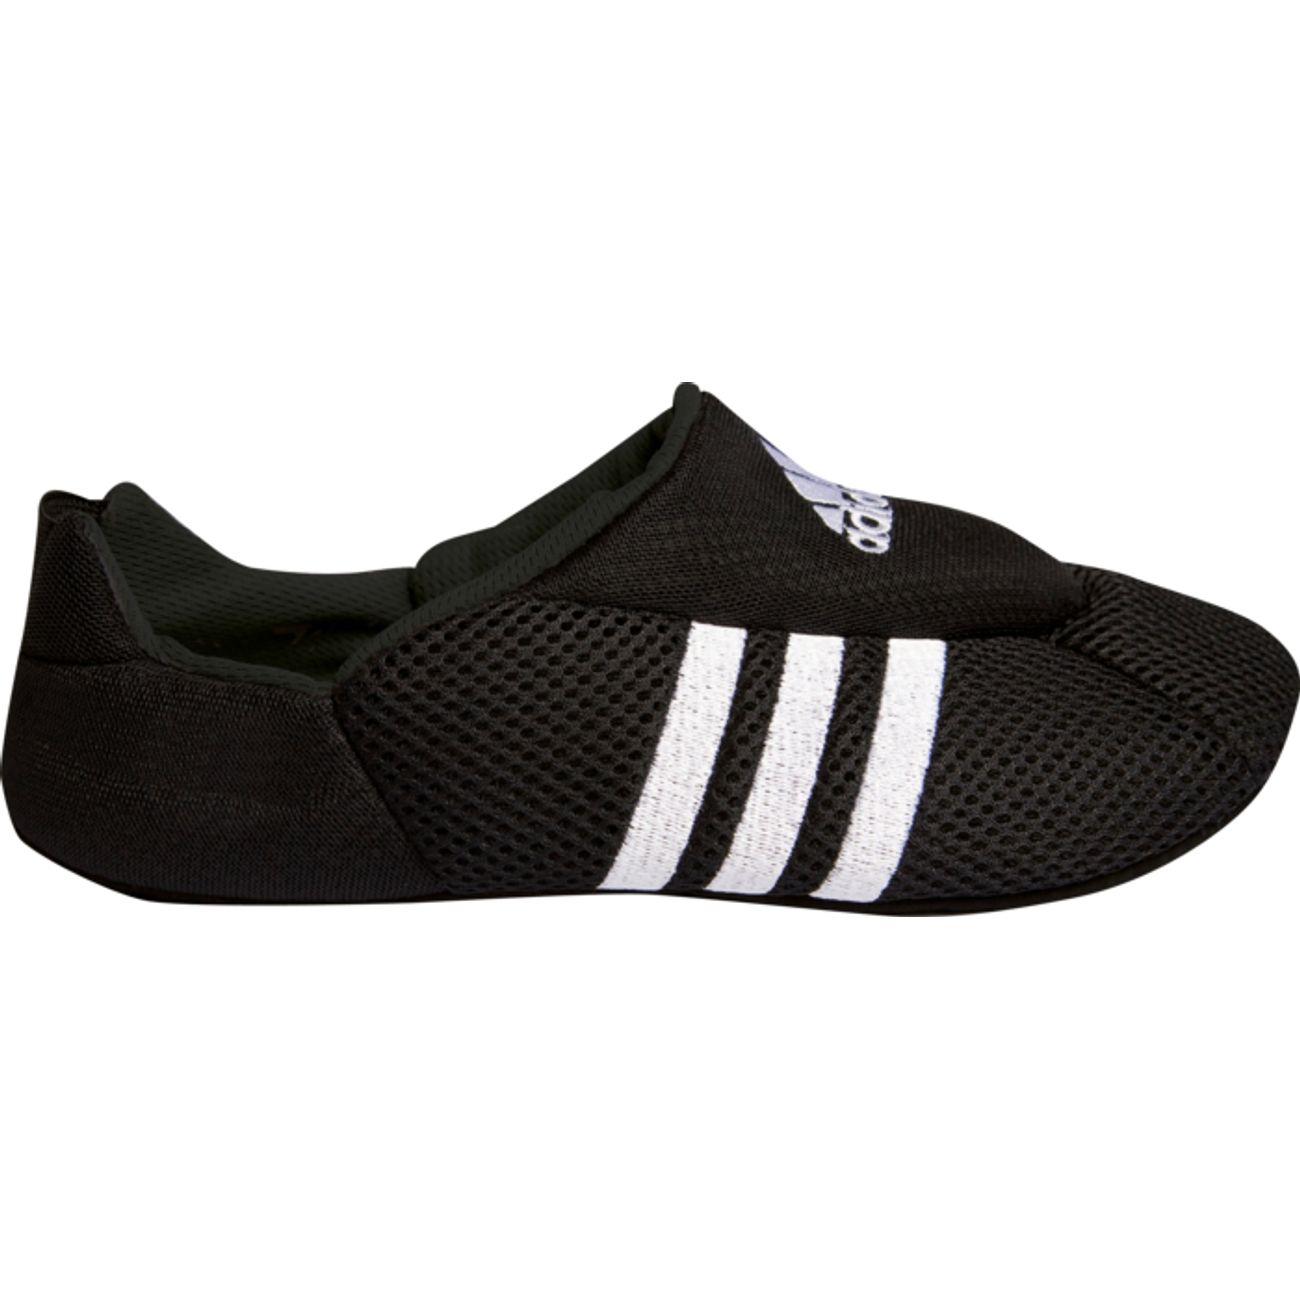 Noir Vapormax Air Chaussures Basses Baskets Nike Noirbleu Plus aq8AxxIS